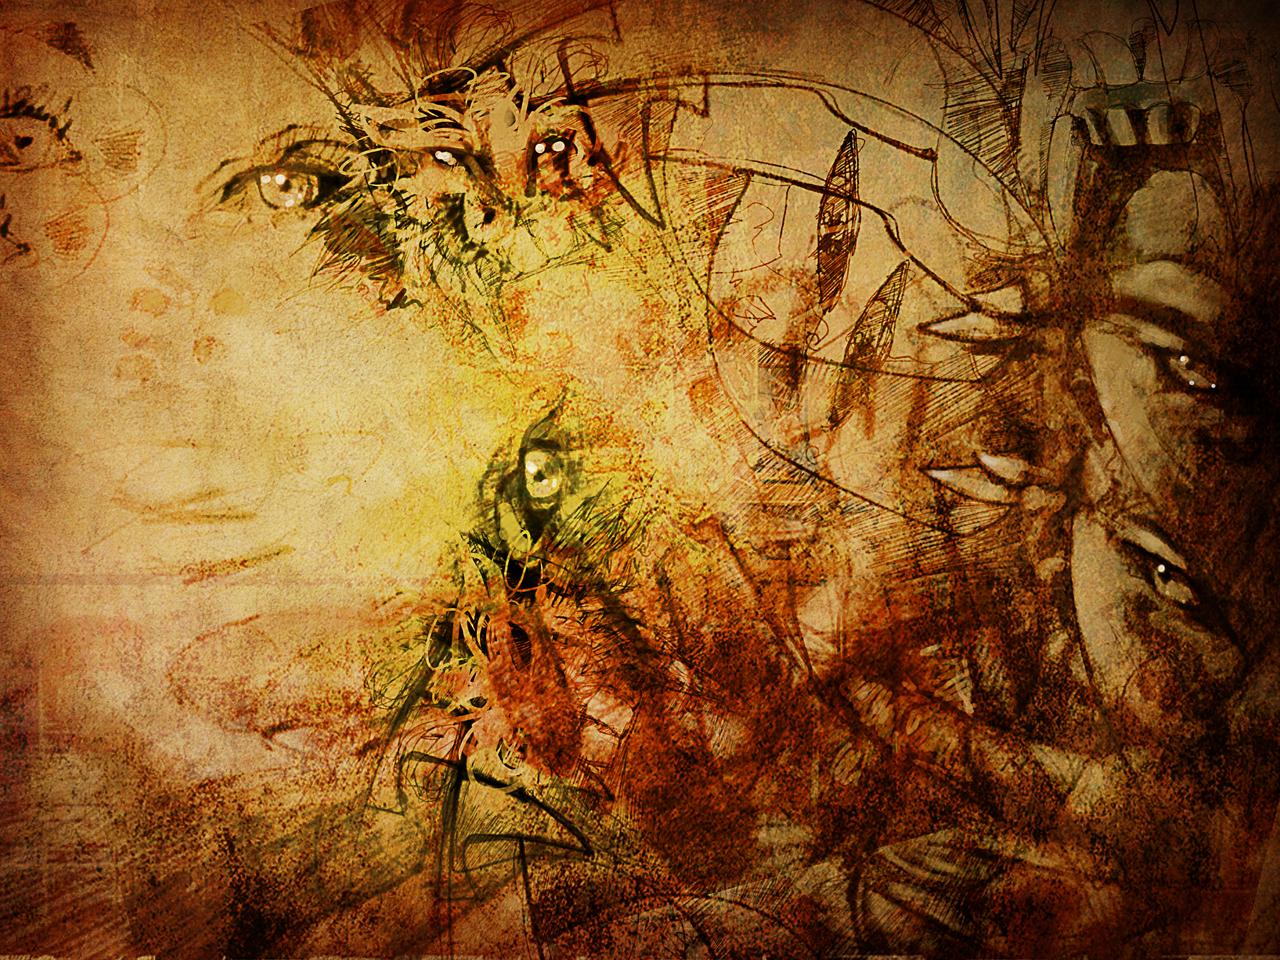 Demon scars